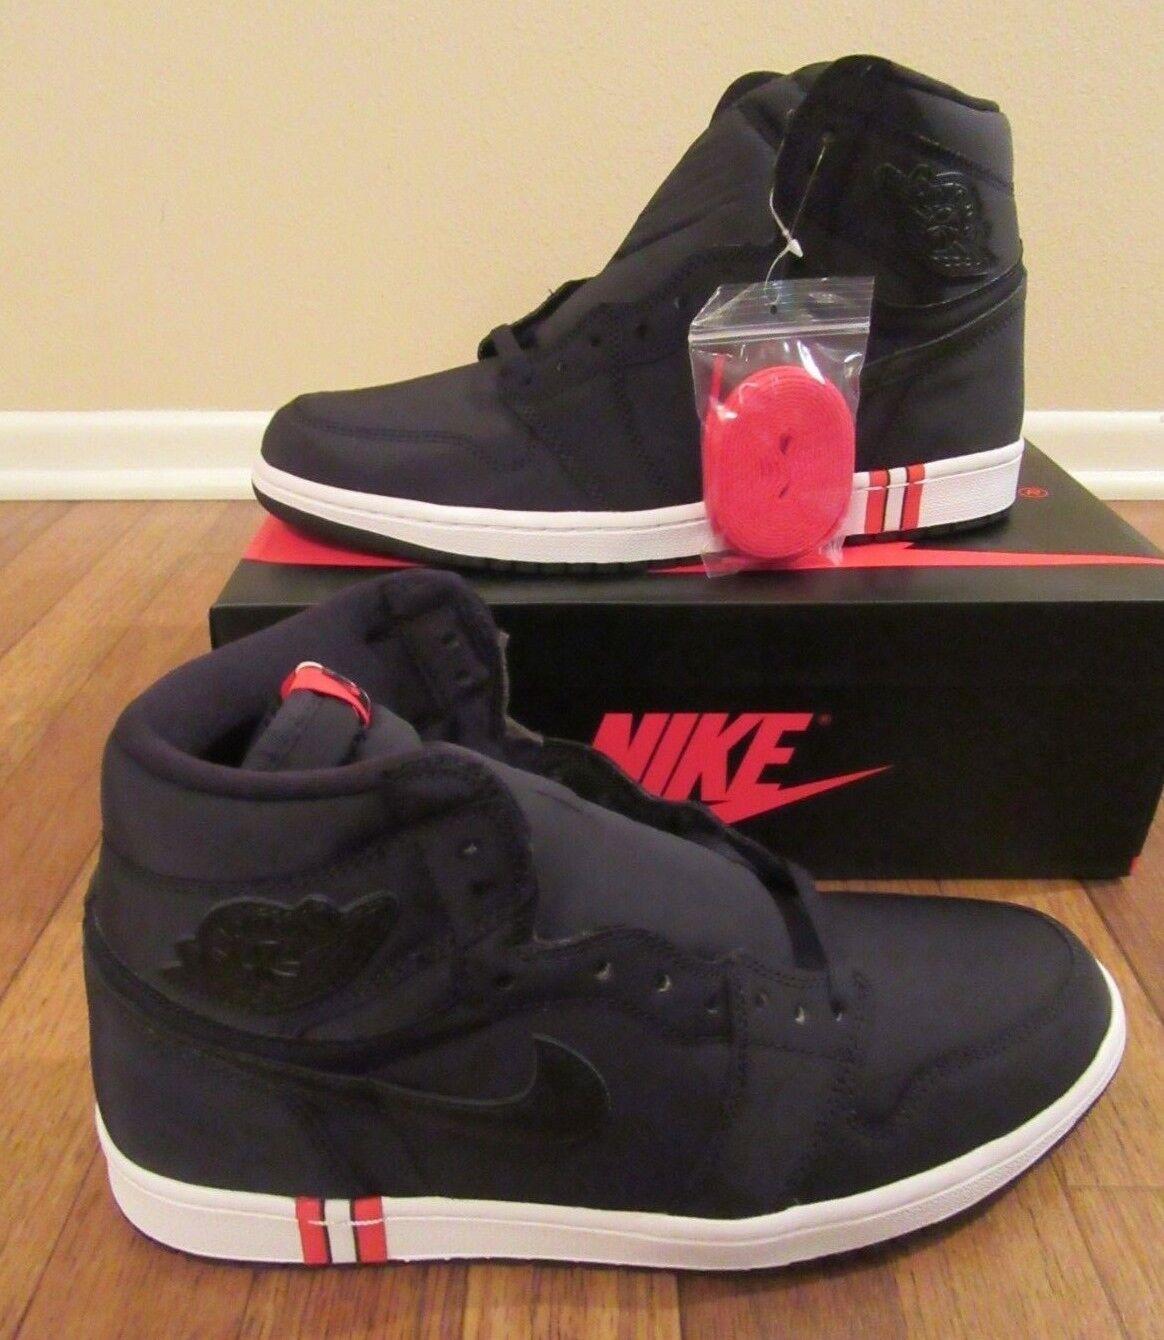 new arrival e0599 51ebd Nike Air Jordan 1 Retro Hi OG BCFC Size 11 Paris Saint-germain PSG Ar3254  001